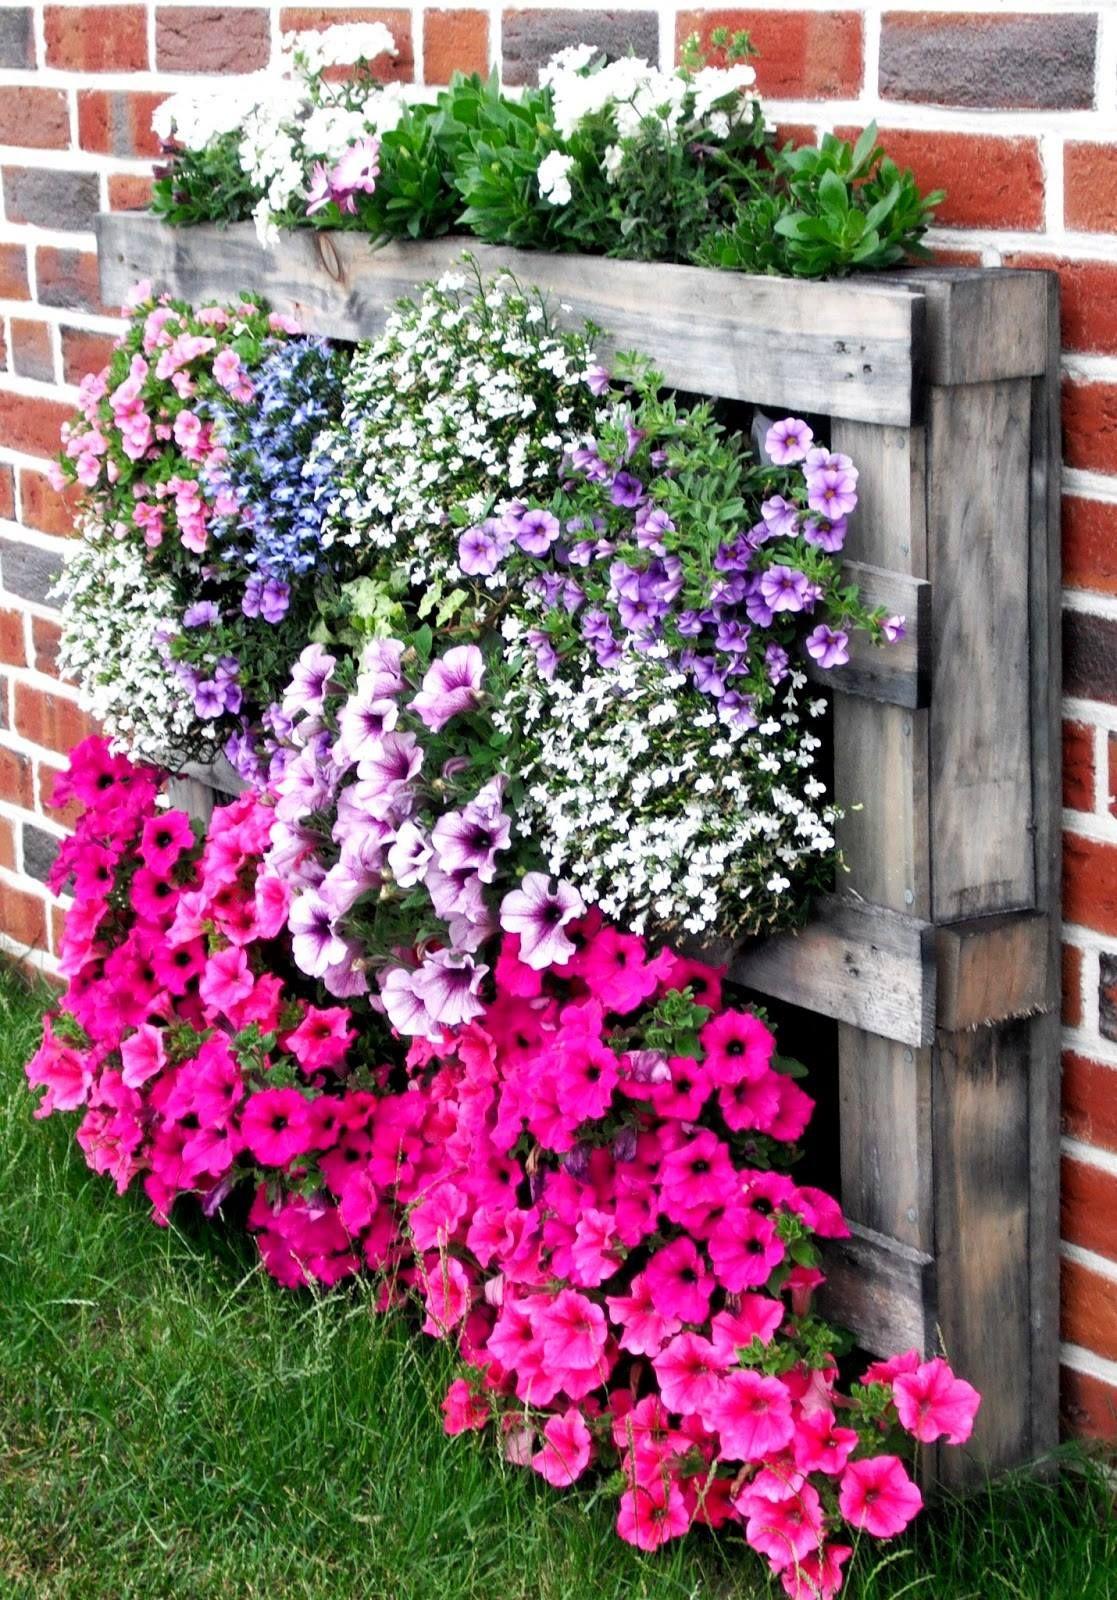 42 jardini res de r cup avec des objets insolites jardinage pinterest objet insolite pots. Black Bedroom Furniture Sets. Home Design Ideas